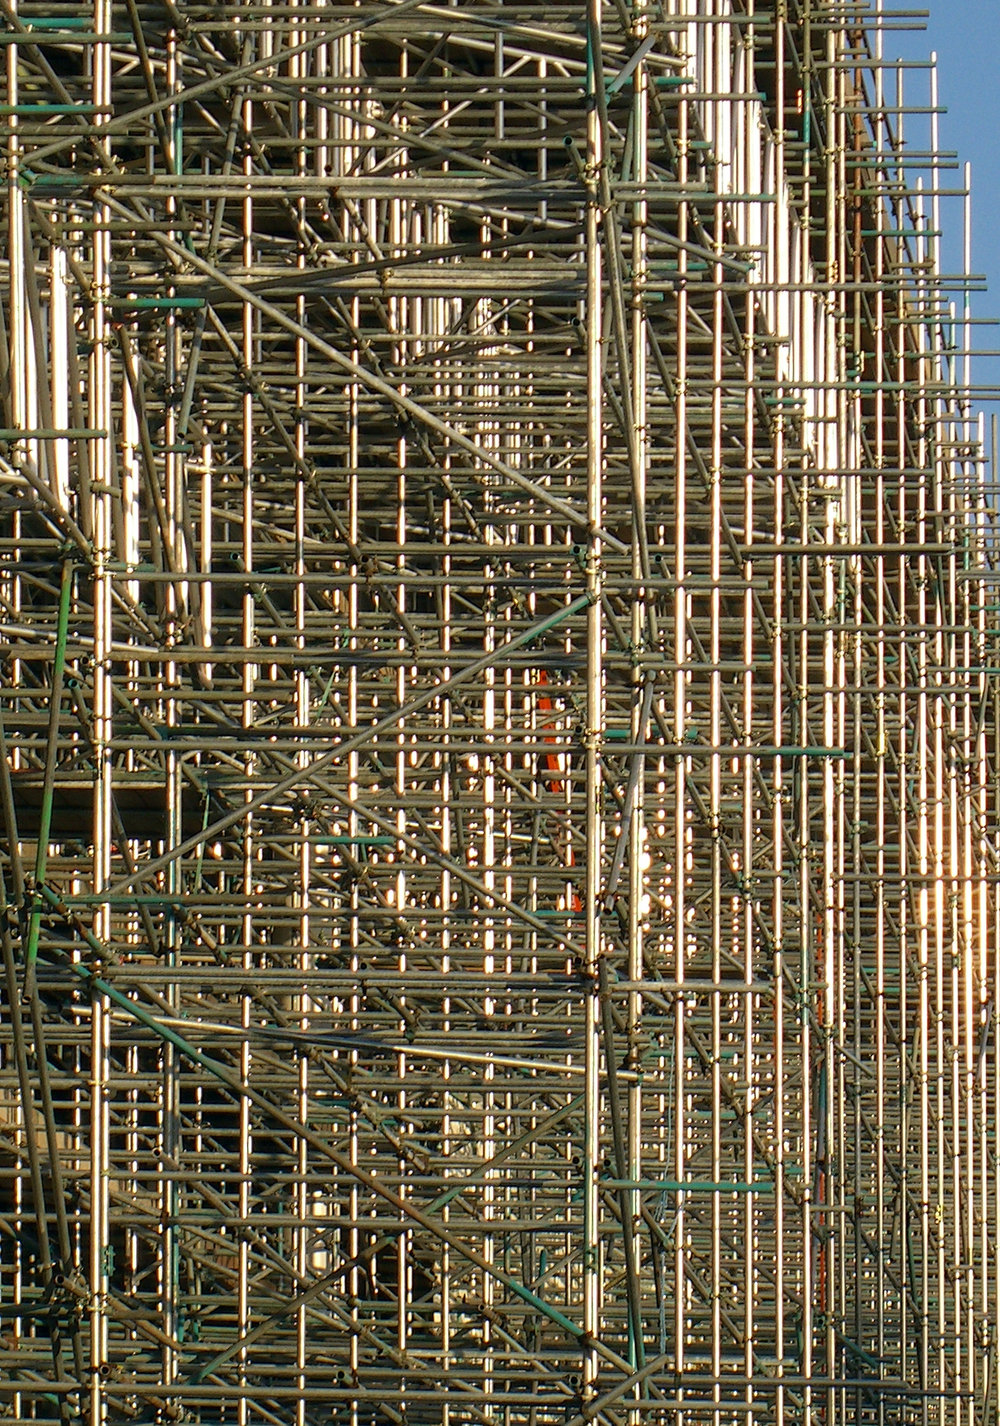 scaffolding_1149 straight.jpg